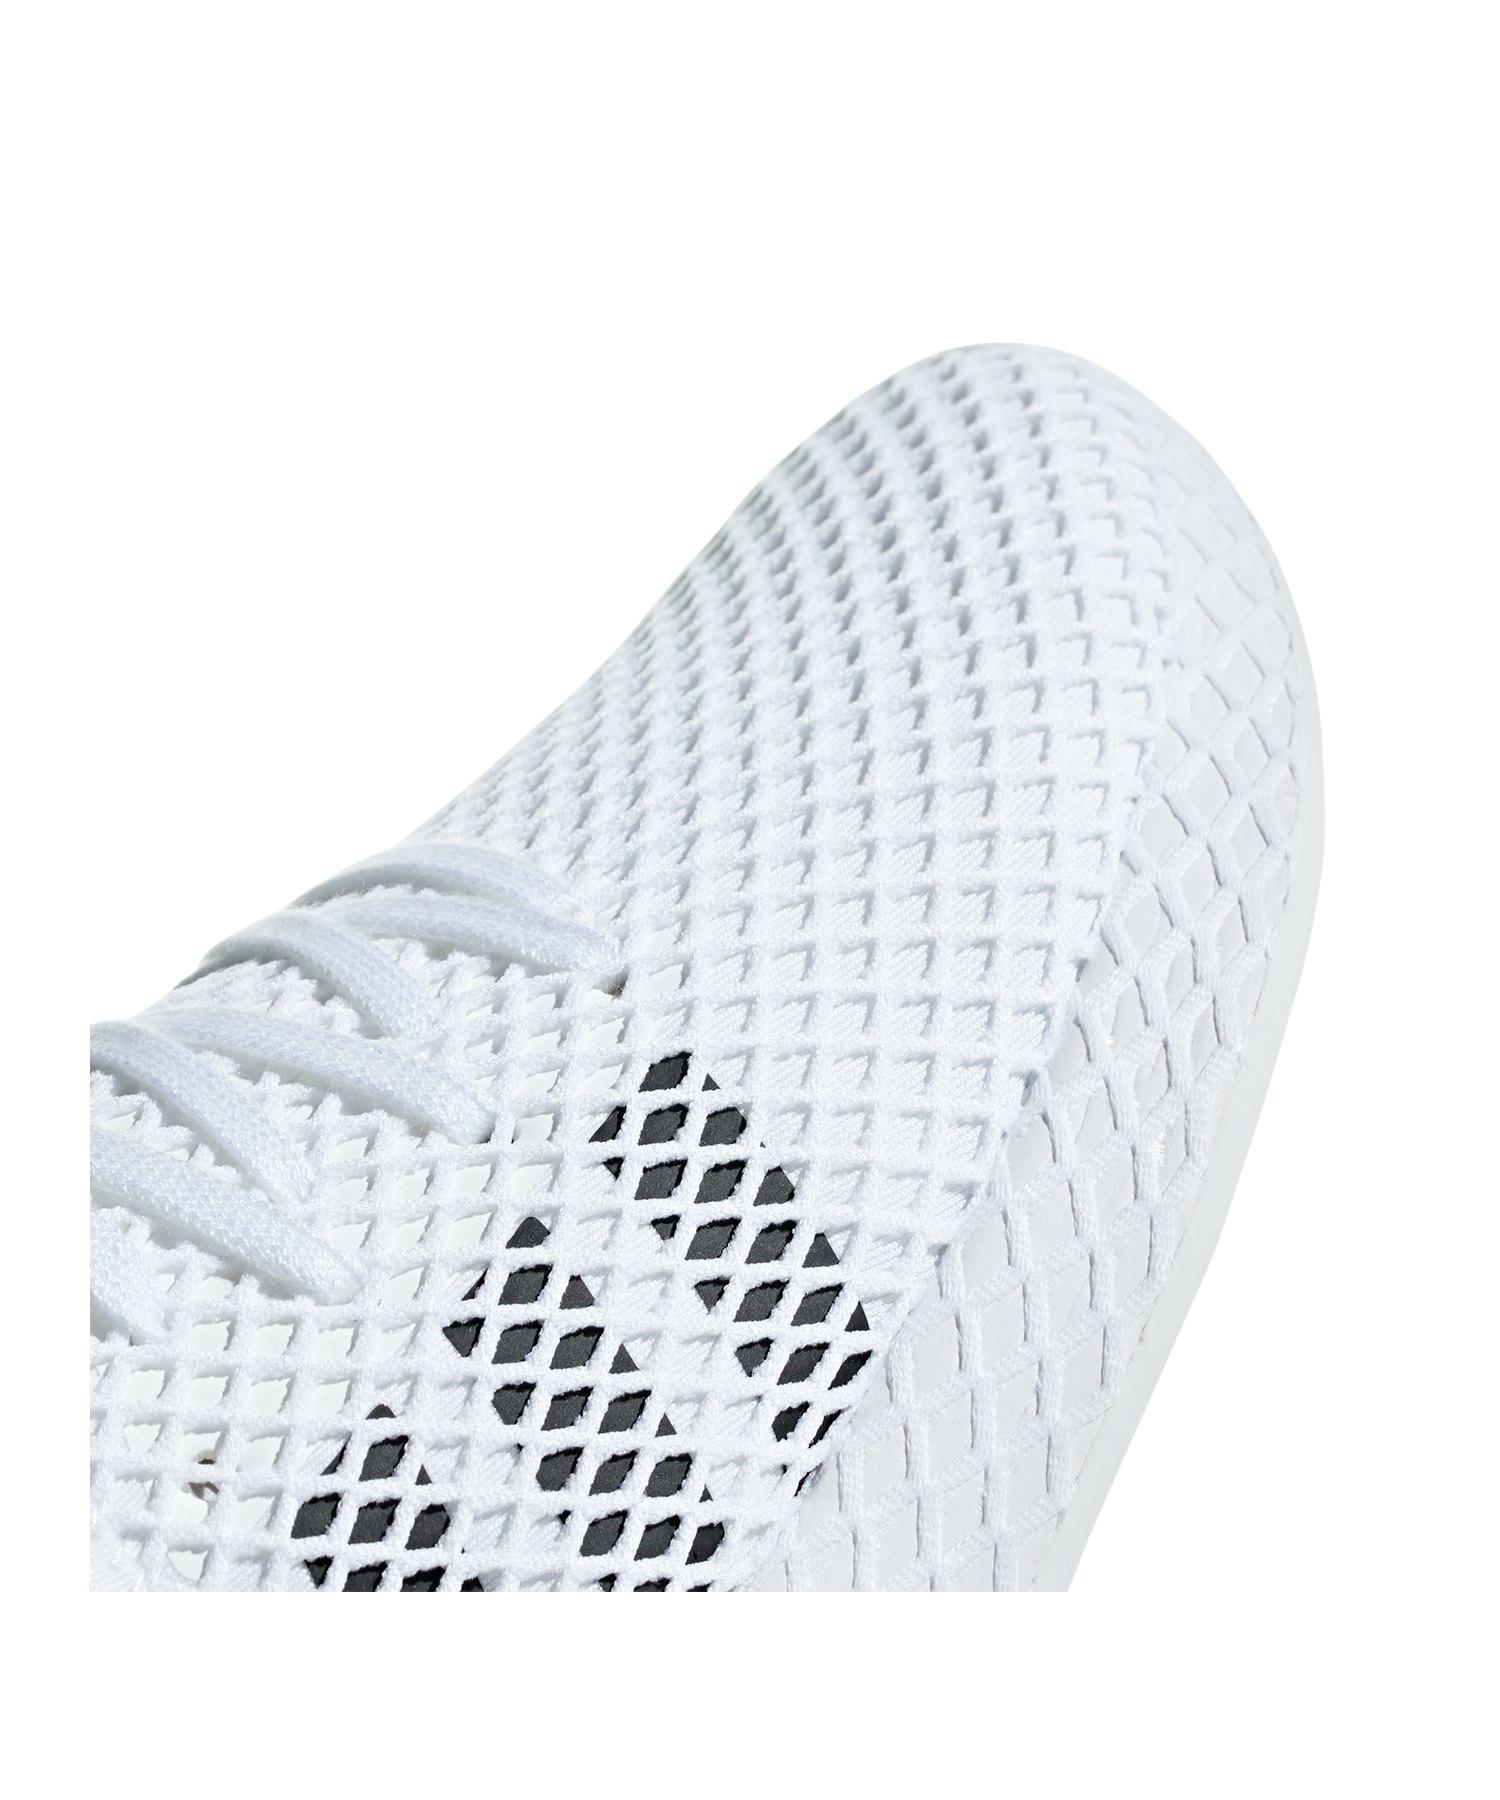 Weiss Originals Adidas Runner Deerupt Sneaker 354ajrl yYb76gfv